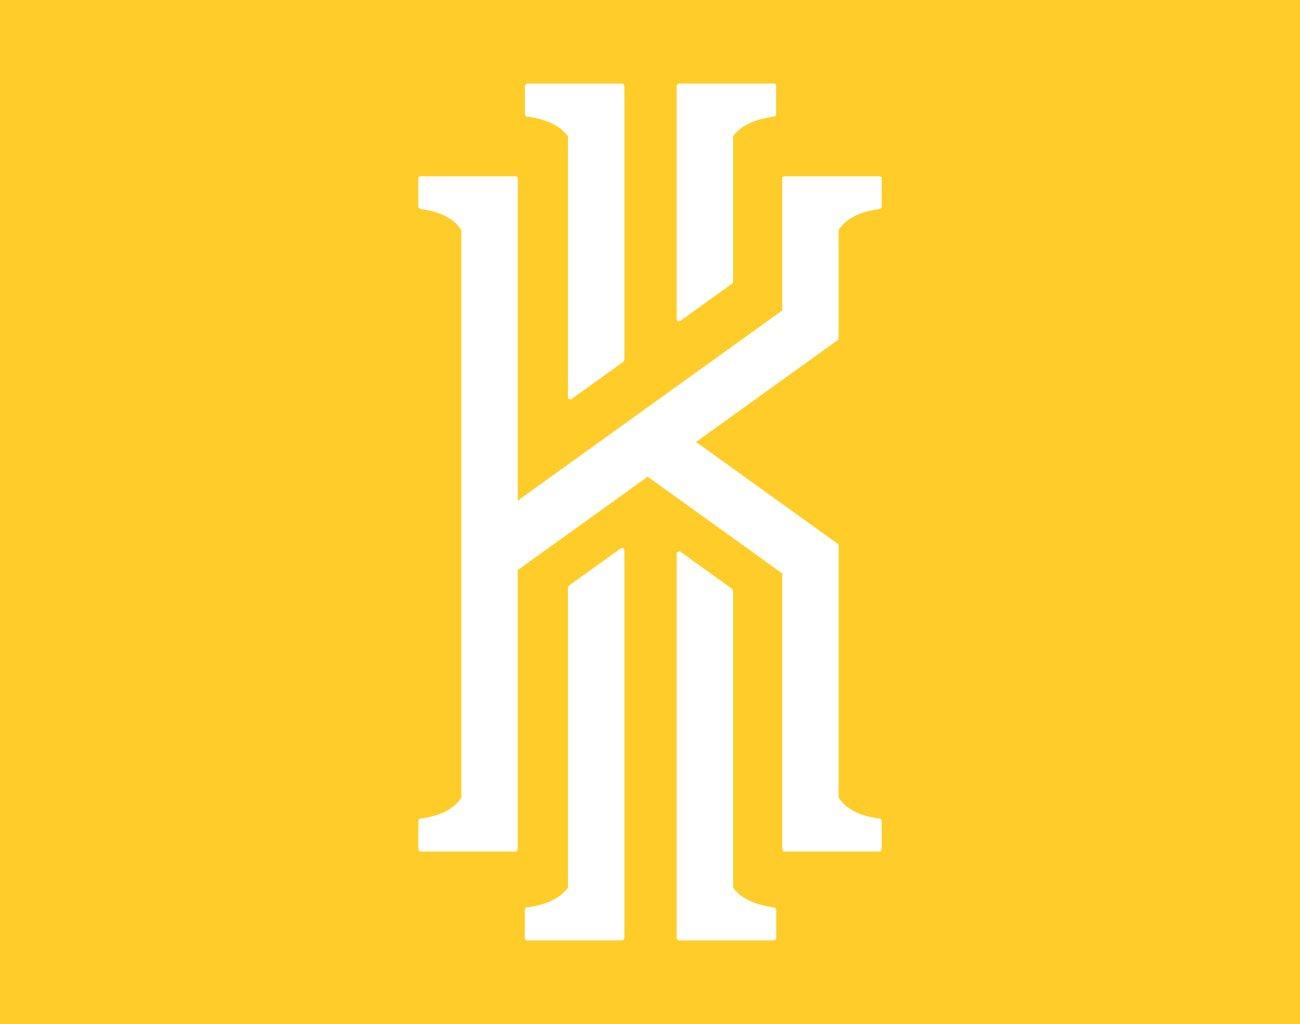 Popular Wallpaper Logo Kyrie - Font-Kyrie-Irving-Logo  Graphic_526039.jpg